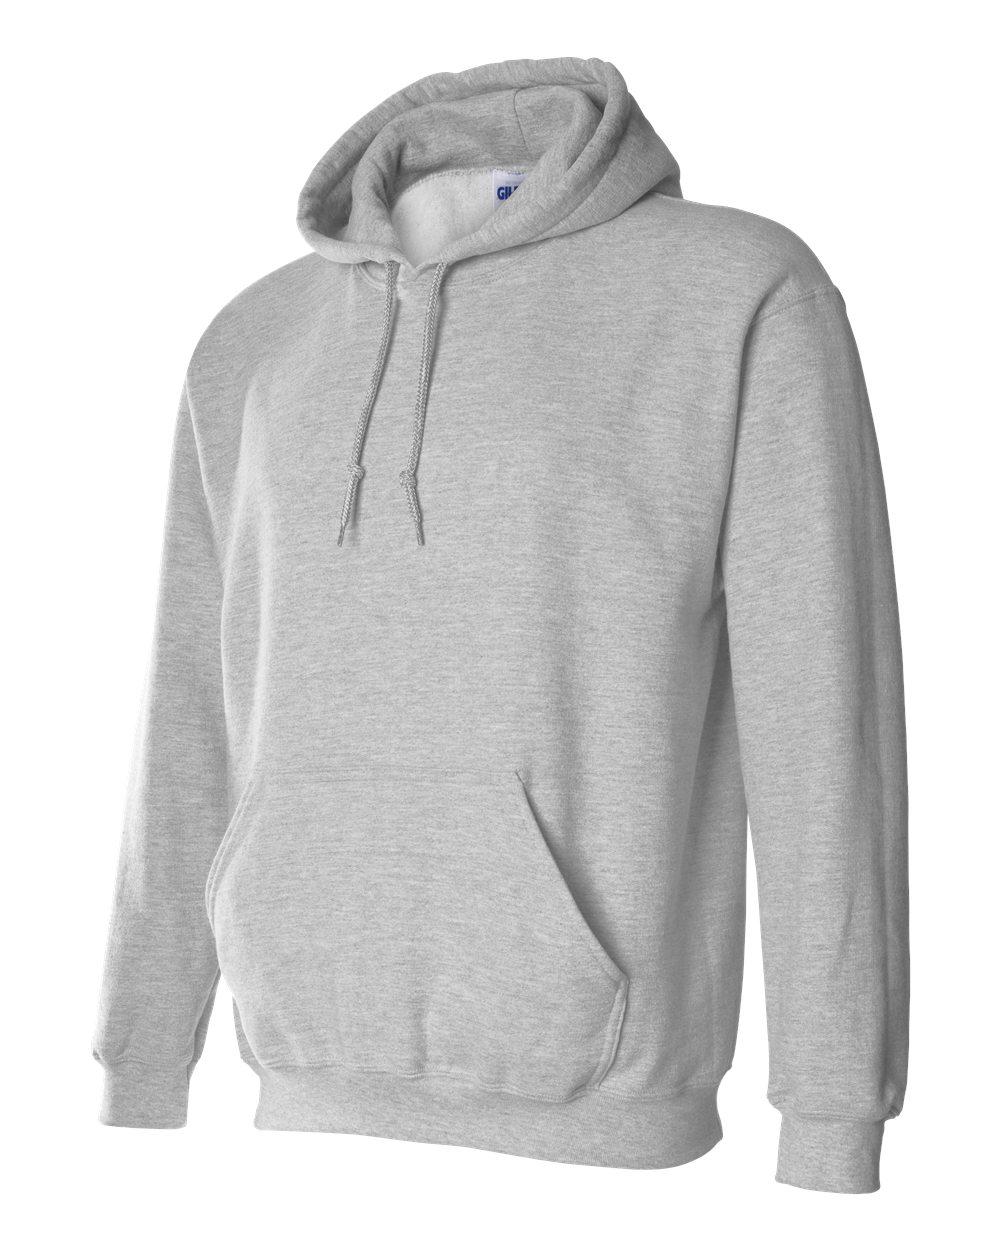 Gildan Heavy Blend Hooded Sweatshirt GI18500 Sports Grey